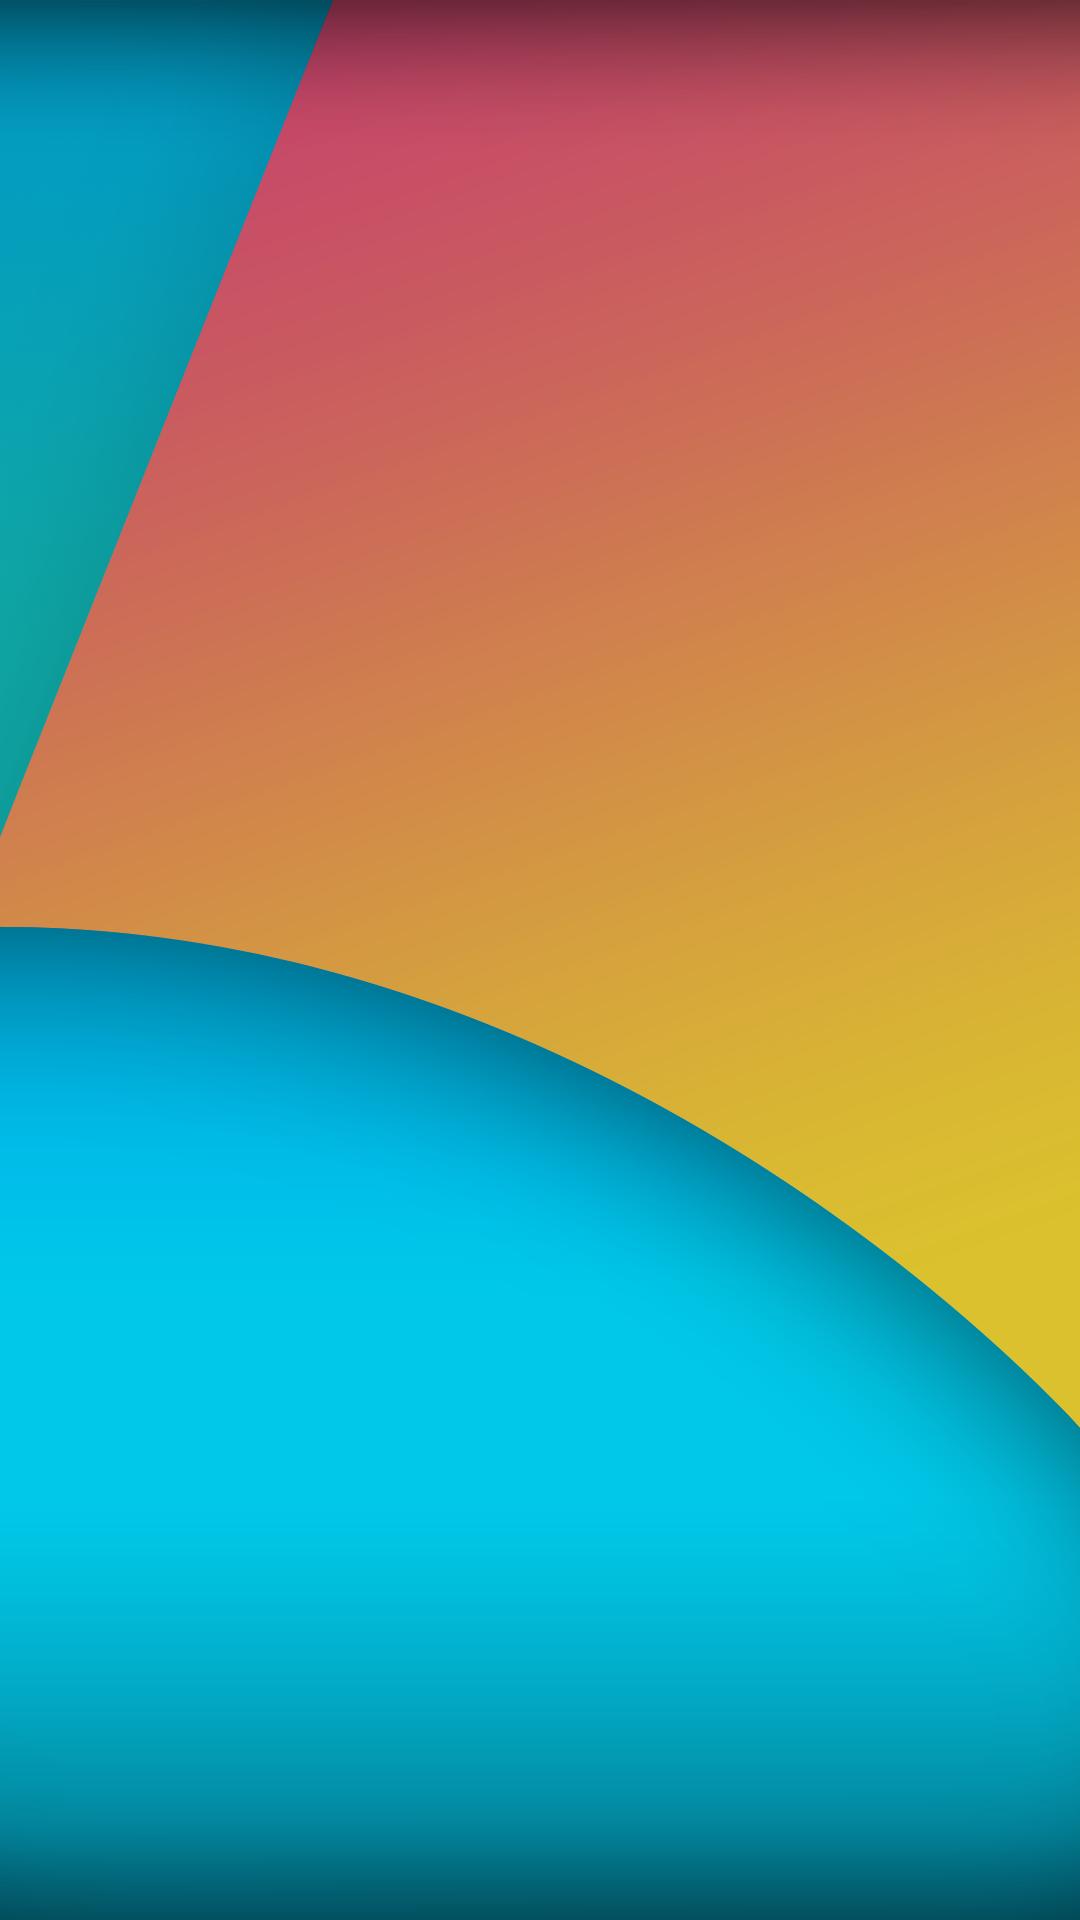 download nexus 5 android 44 kitkat stock background